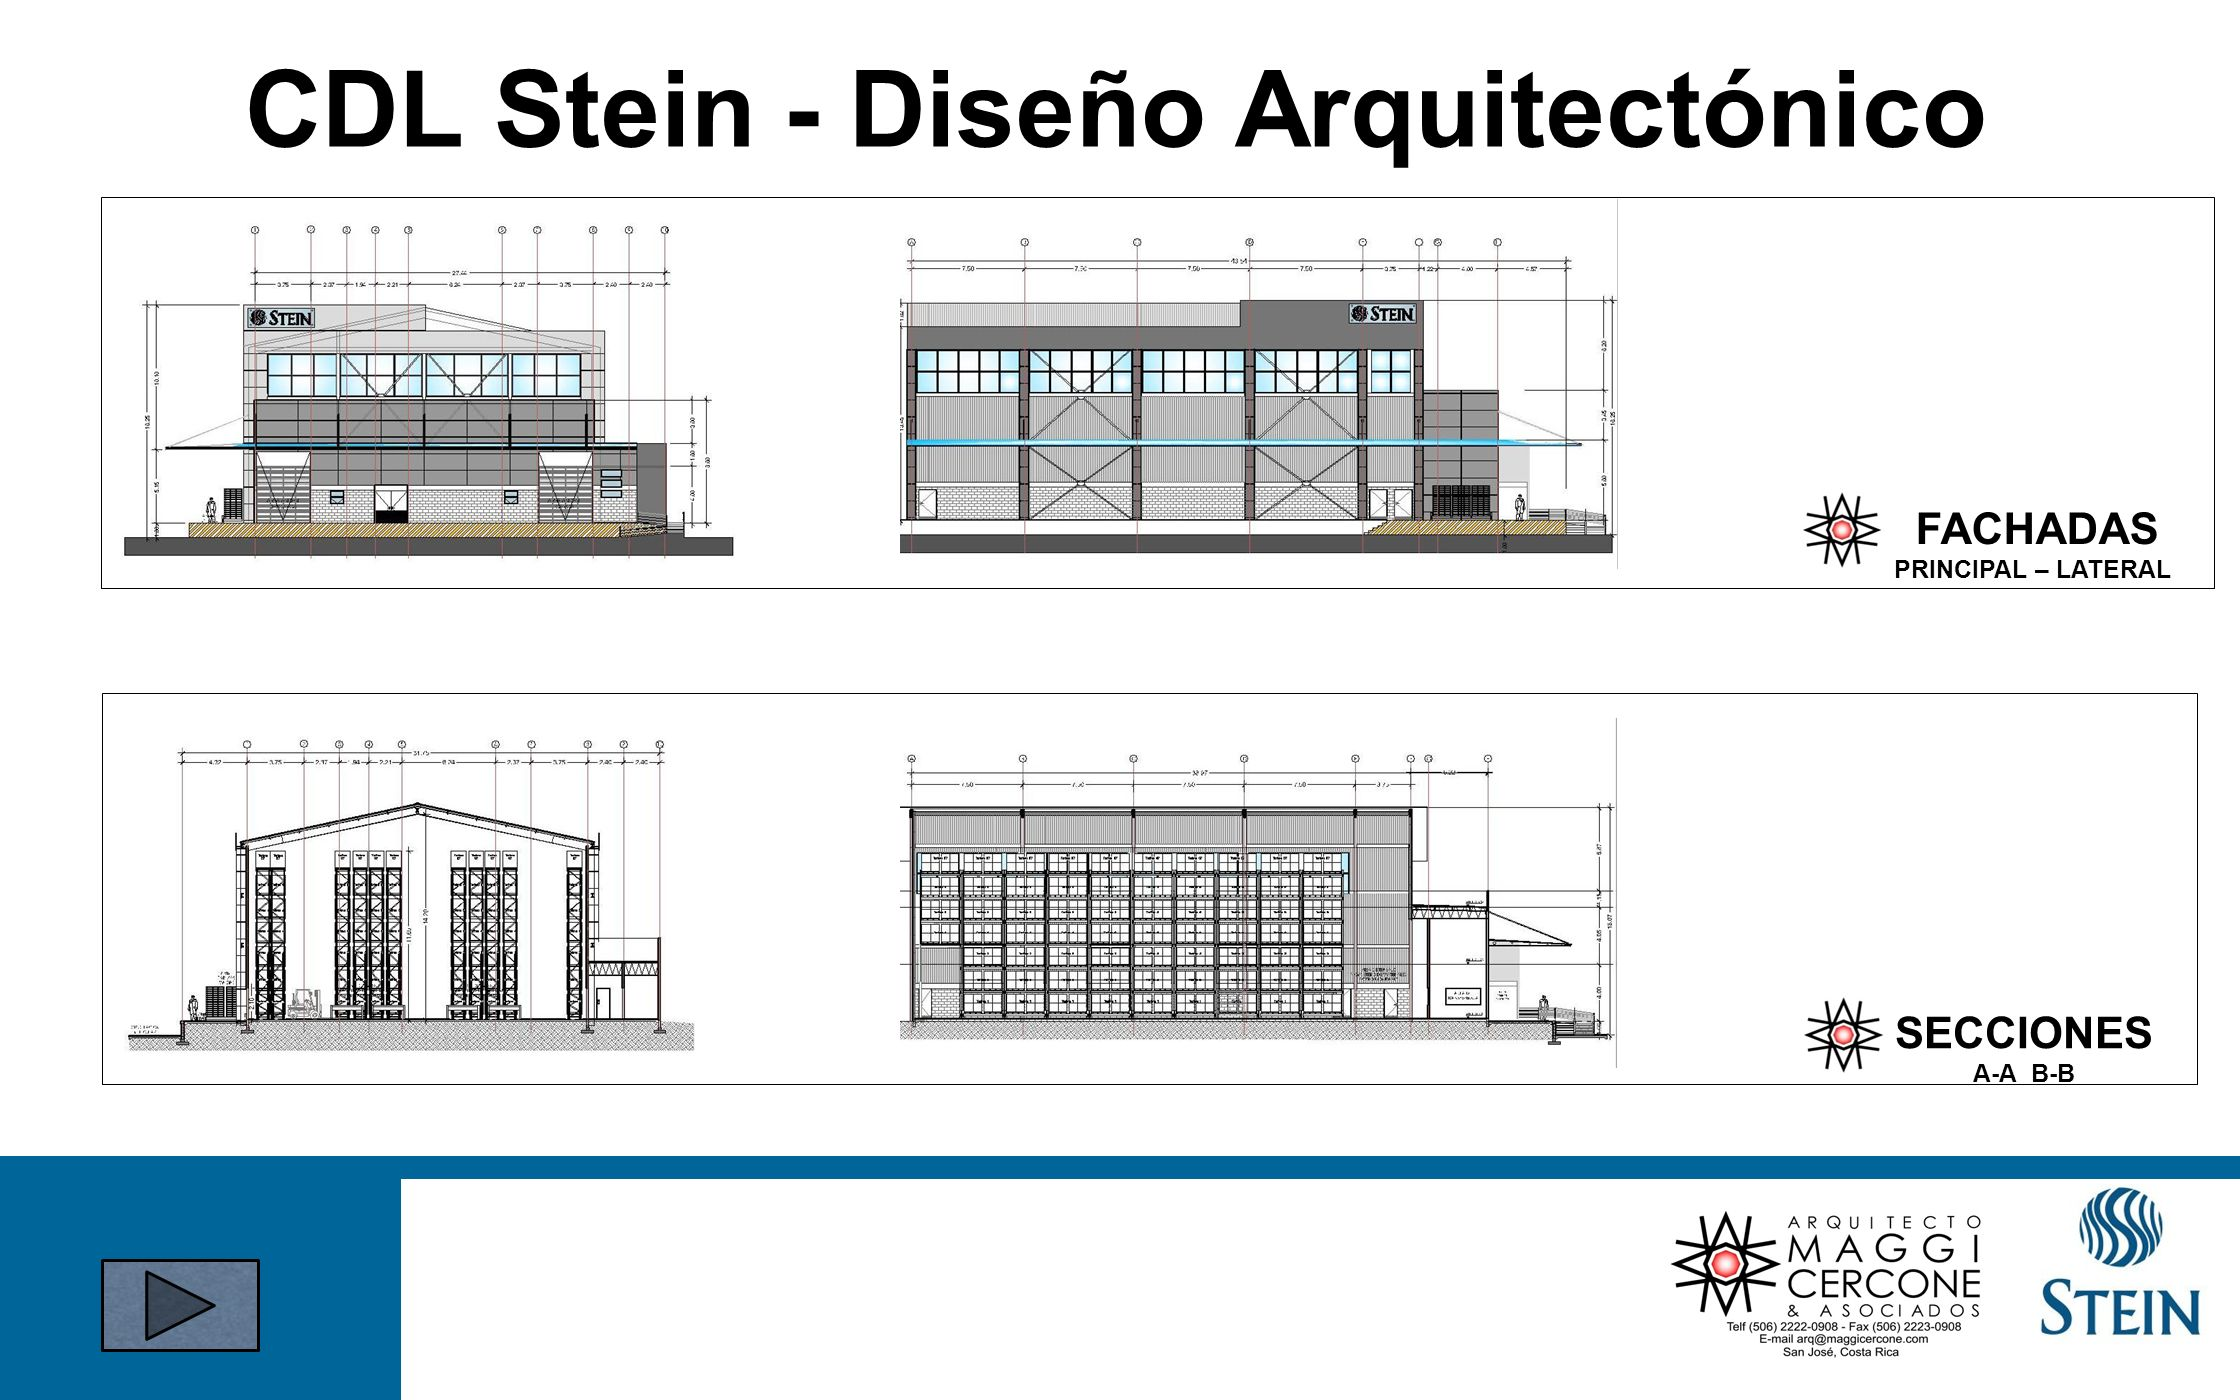 CDL Stein - Diseño Arquitectónico